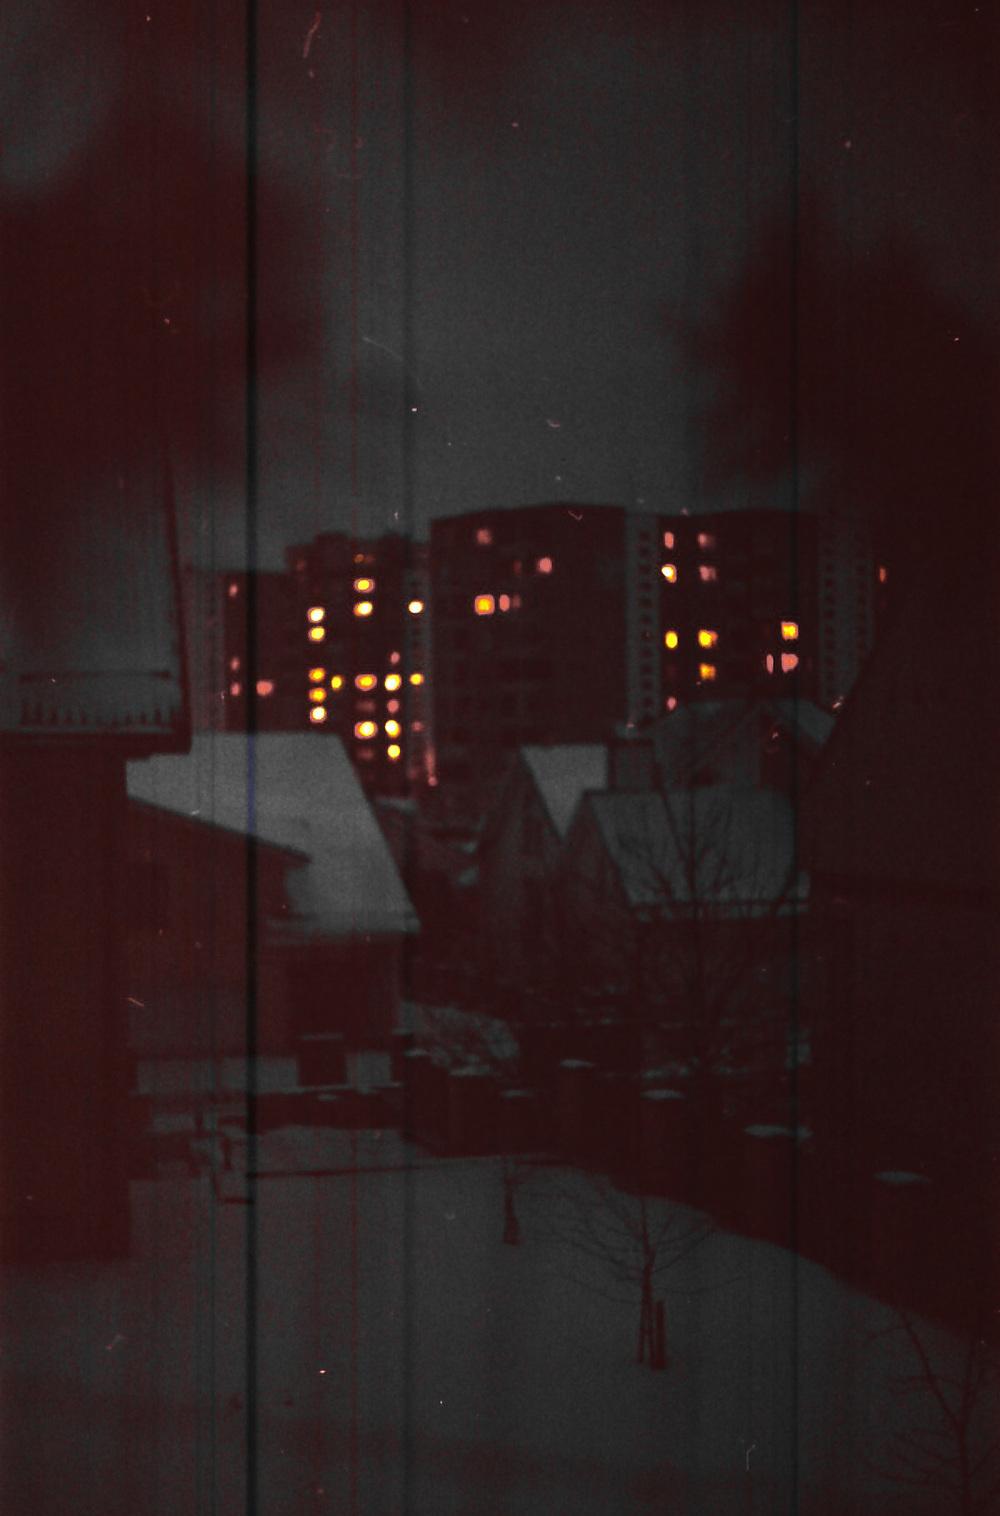 Untitled-Scanned-47.jpg